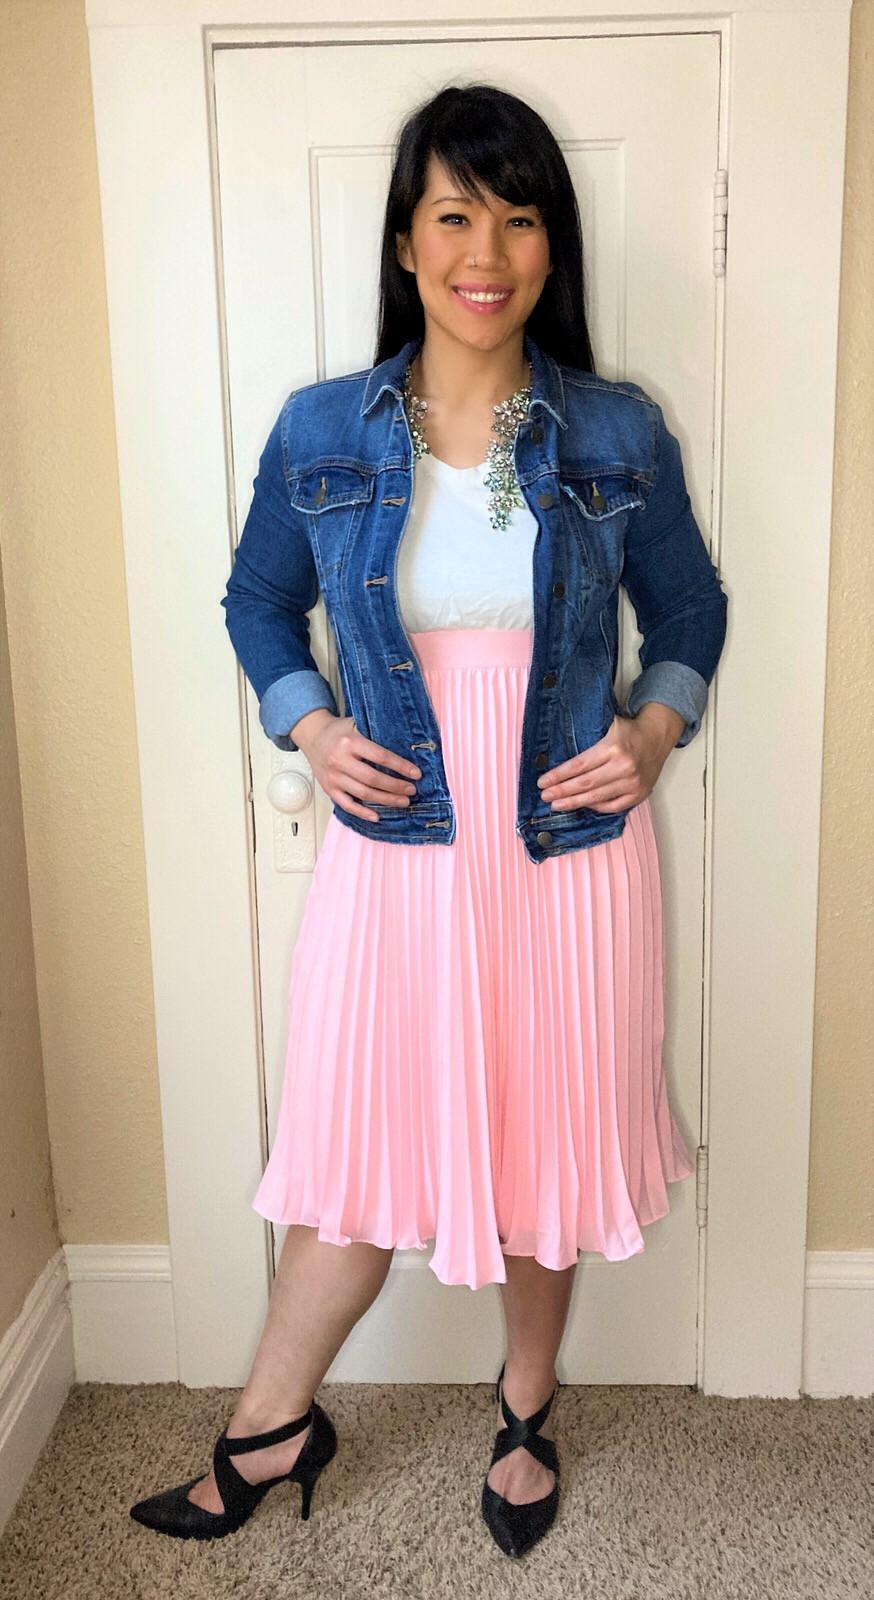 Kat Depner holiday style pink skirt jean jacket